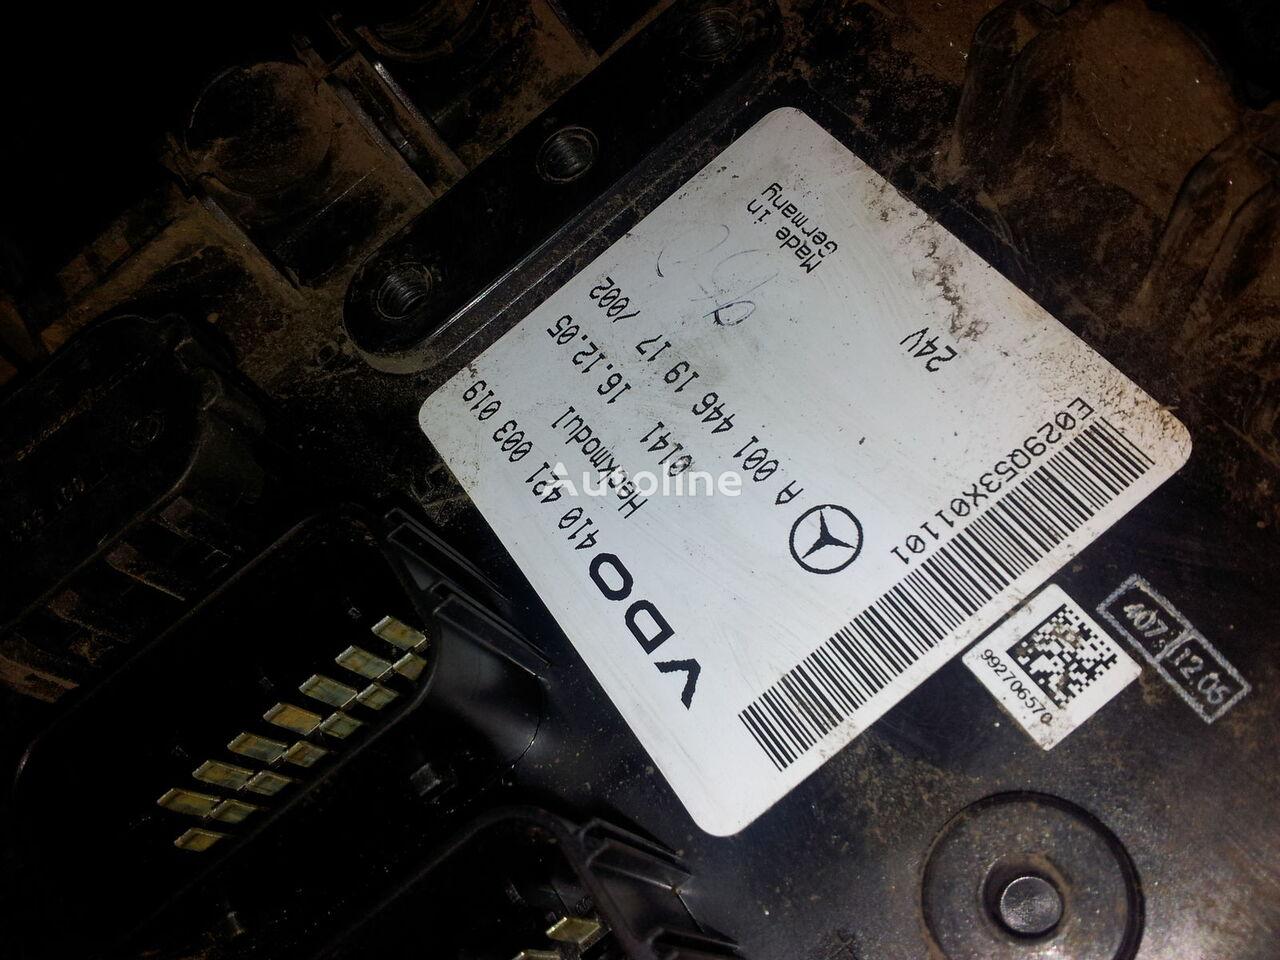 блок за управление  MB Actros MP2, MP3, Heckmodul, control unit, EDC, ECU, rear module electronics, 0014461917, 0014462817, 0014462017,0014461917,0014462717,0014461617, 41021003020, 410421003019, 0014462817 за влекач MERCEDES-BENZ Actros MP2; MP3